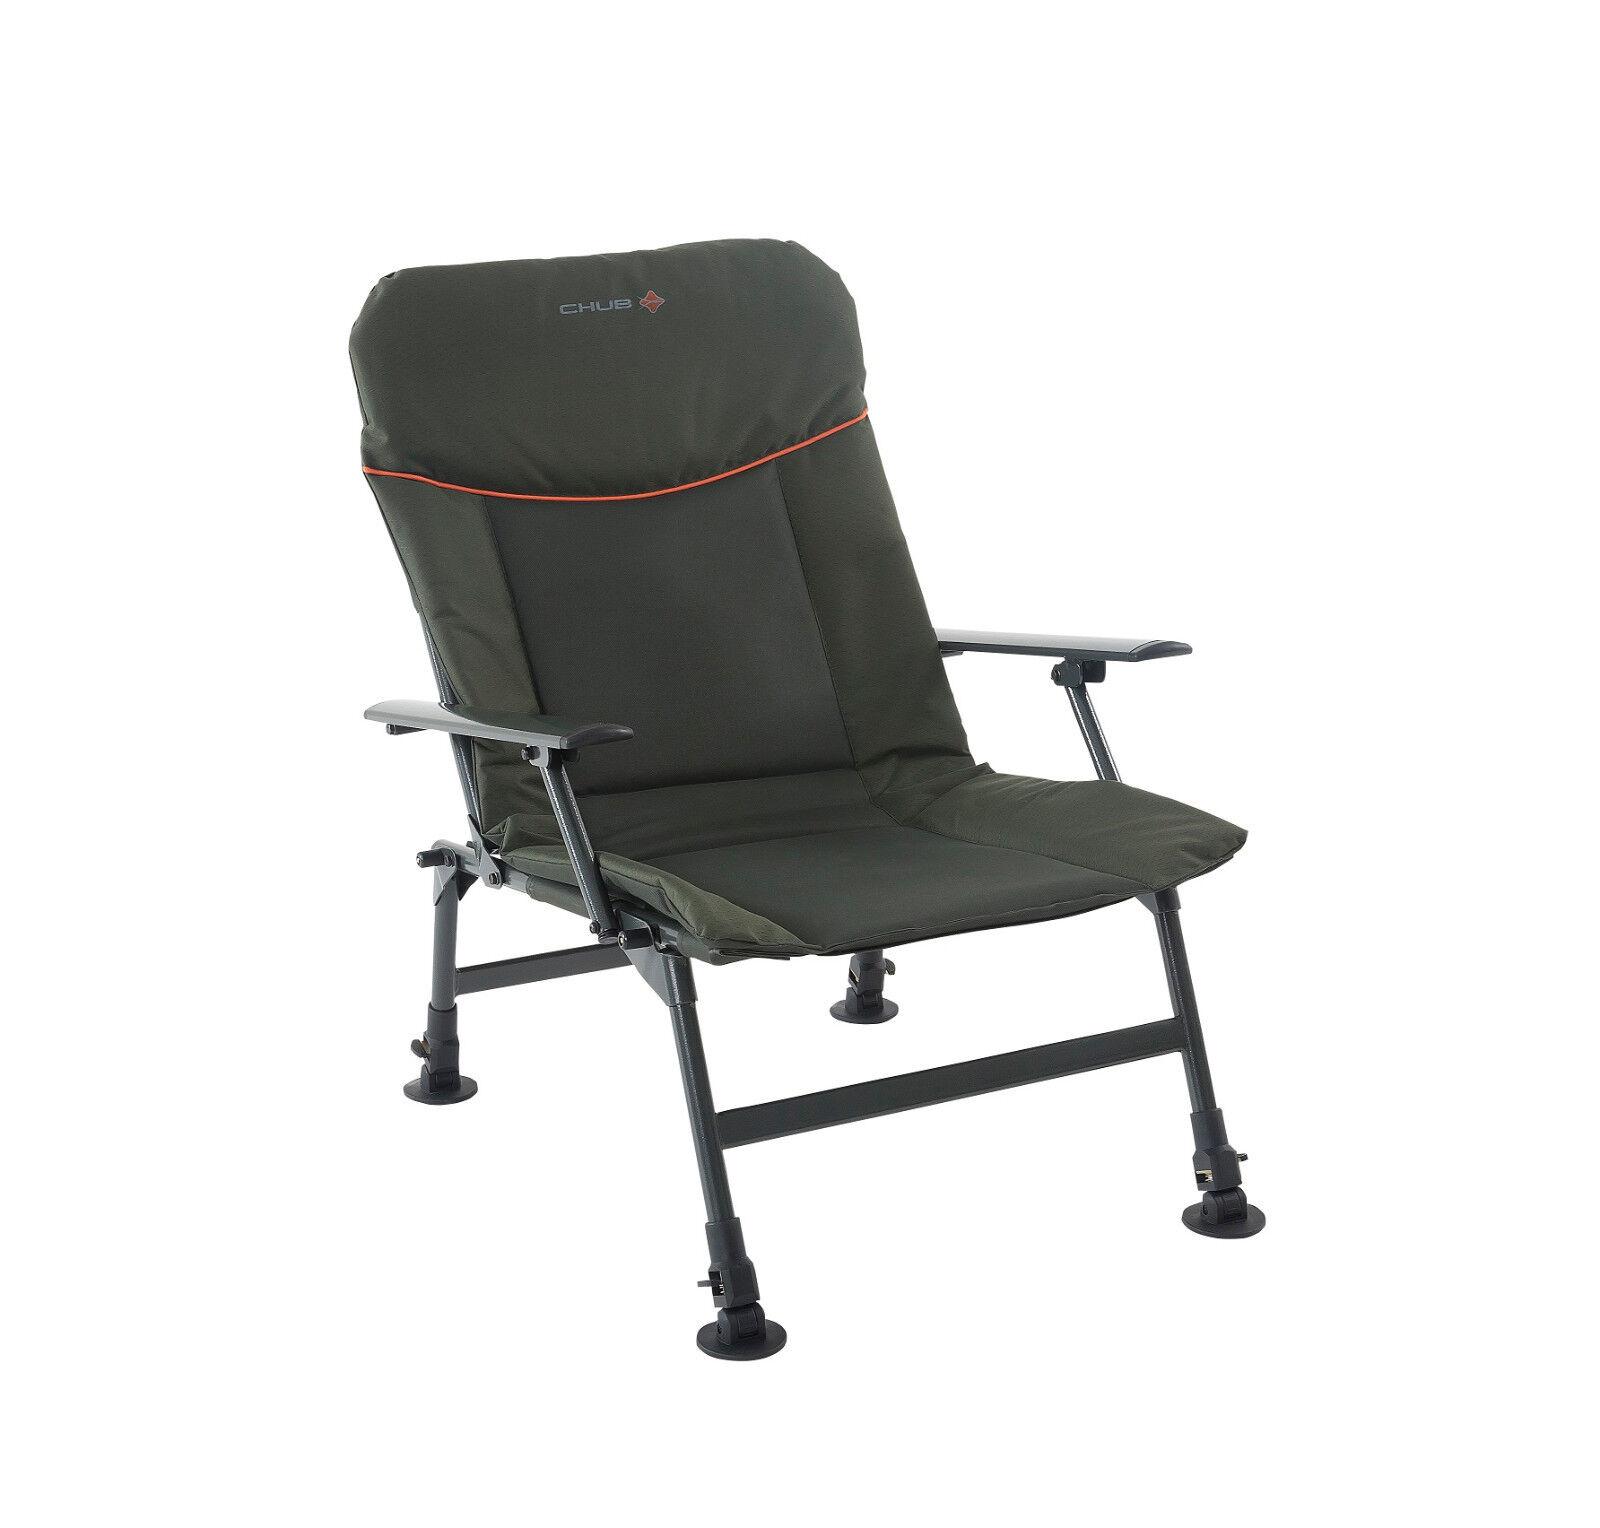 Chub RS plus comfy Chair 1378163 SEDIA ANGEL Sedia Carpa Sedia carpchair